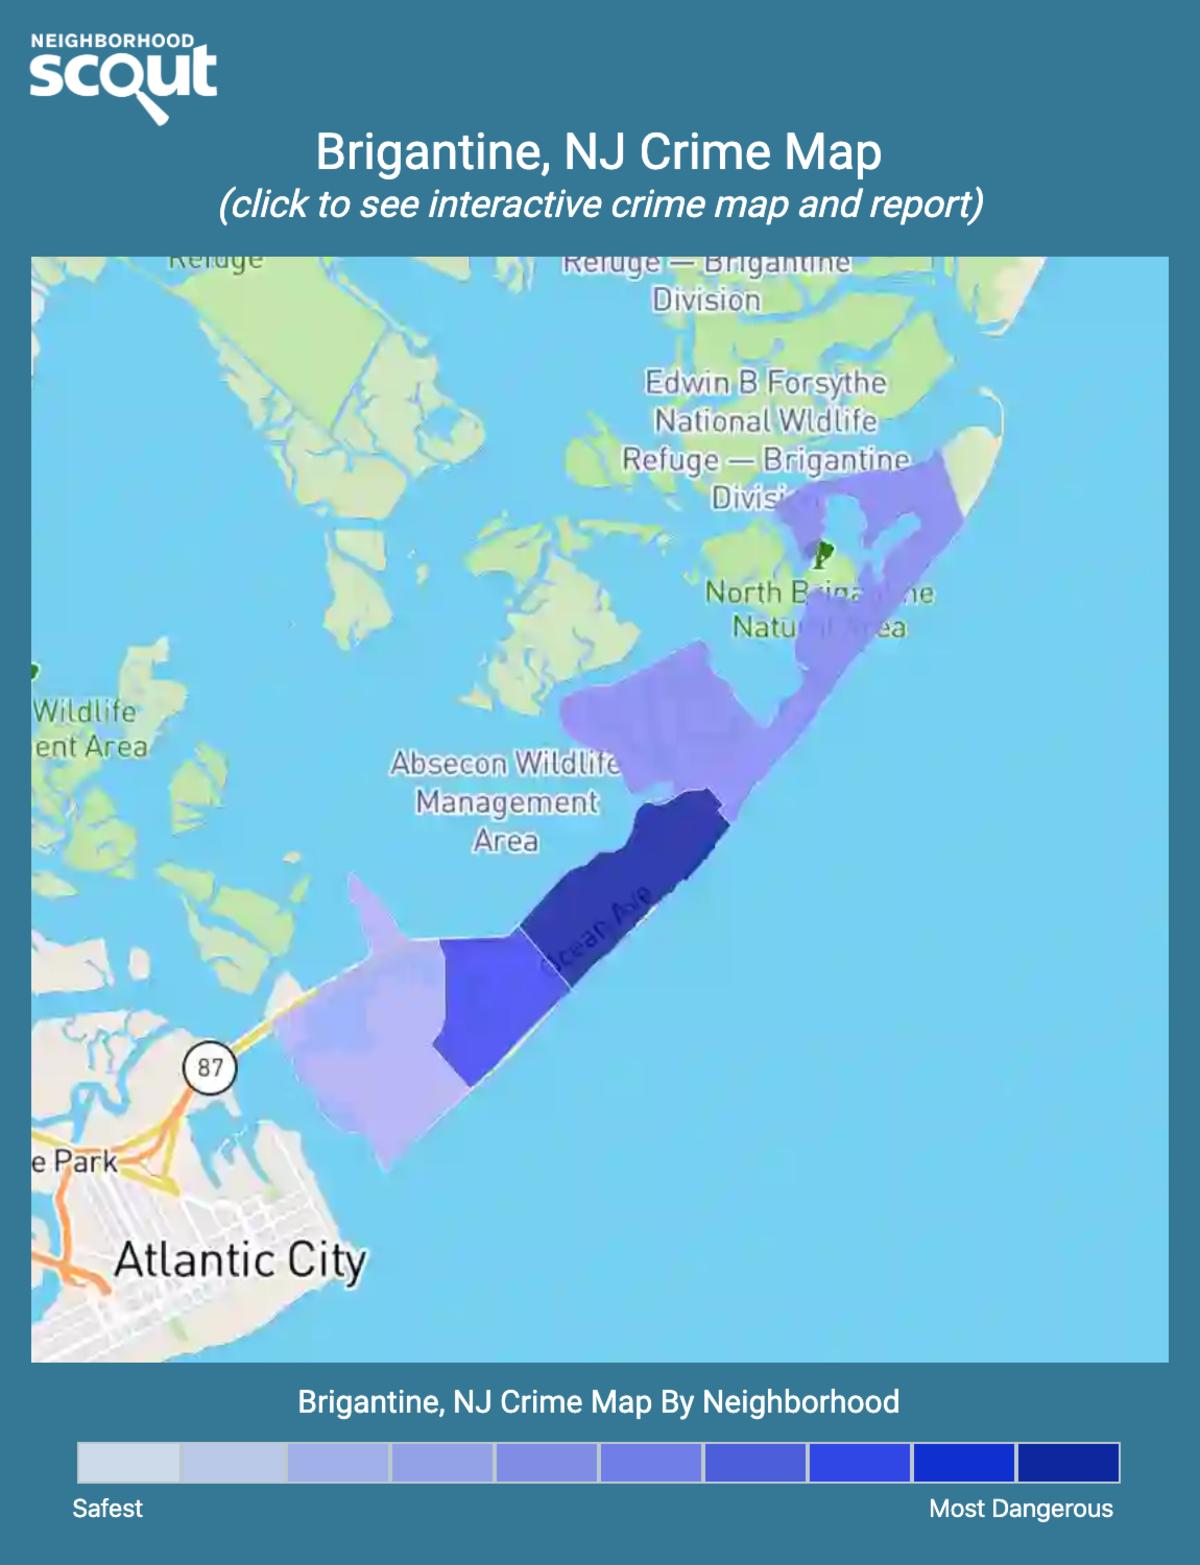 Brigantine, New Jersey crime map